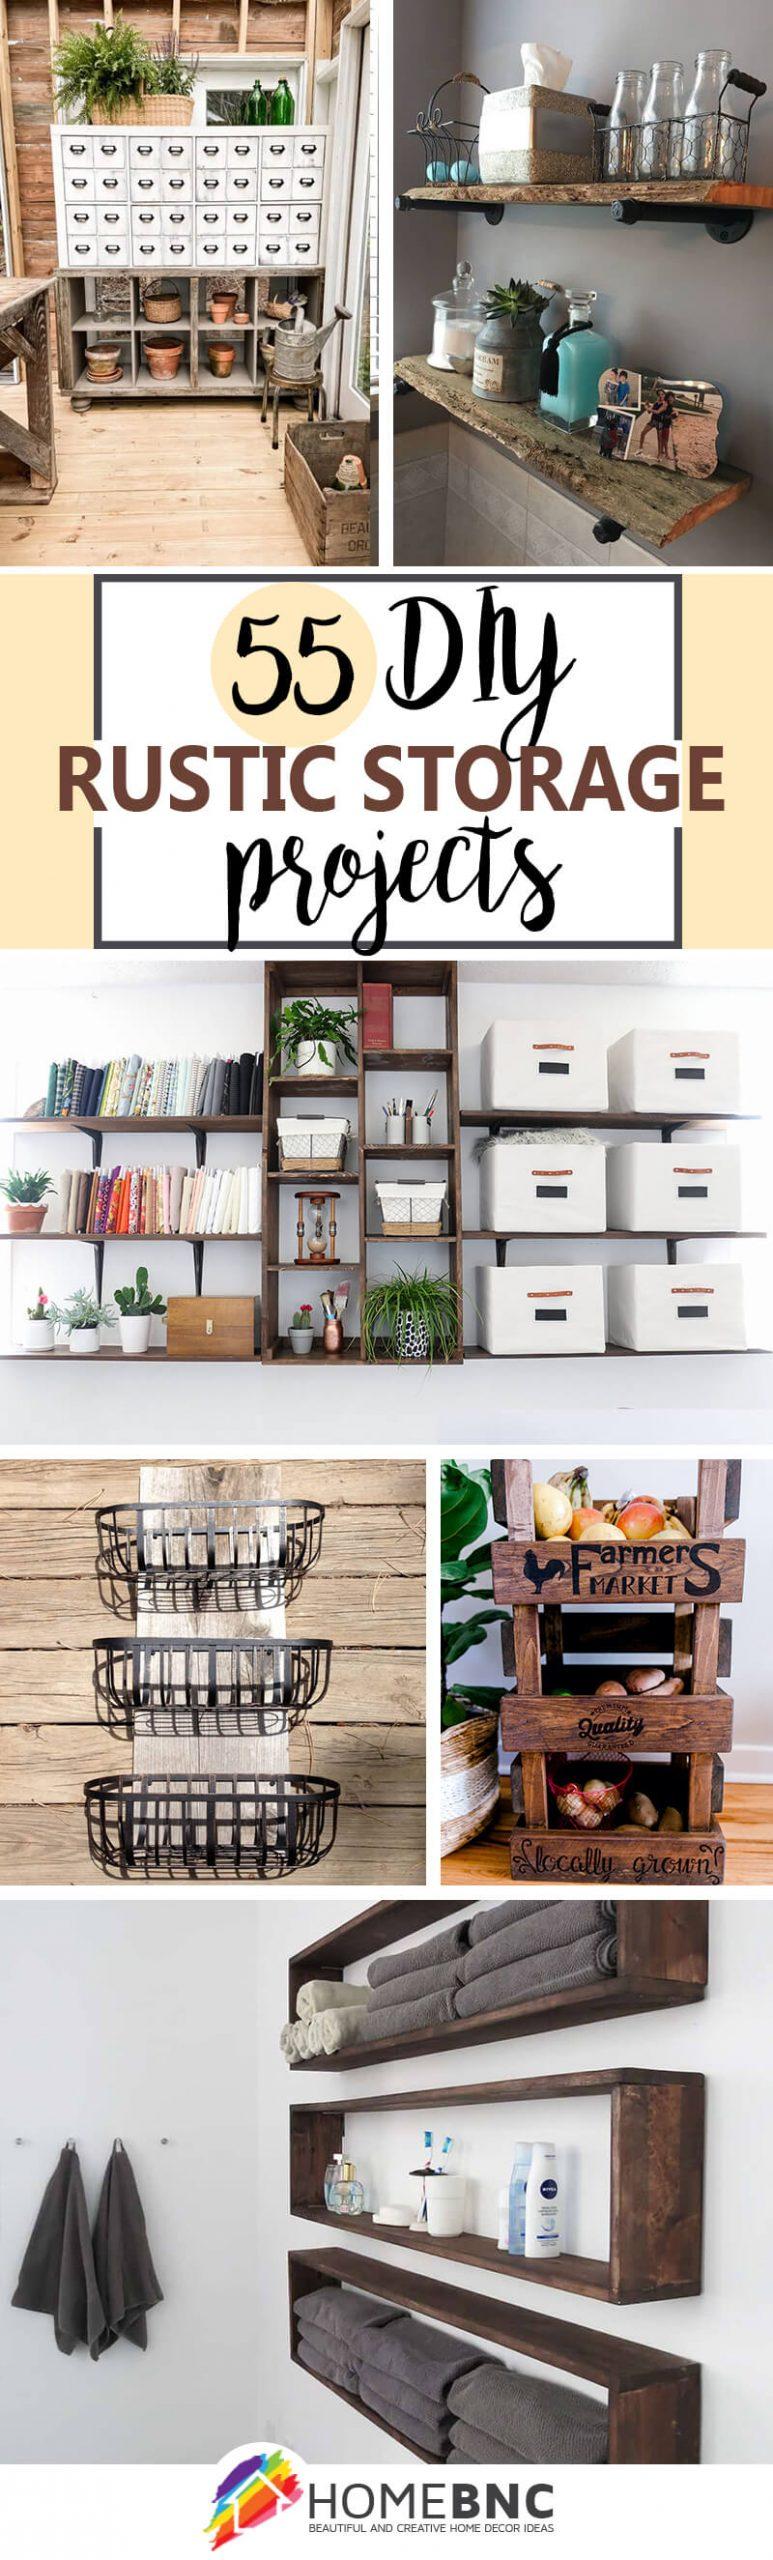 DIY Rustic Storage Project Ideas